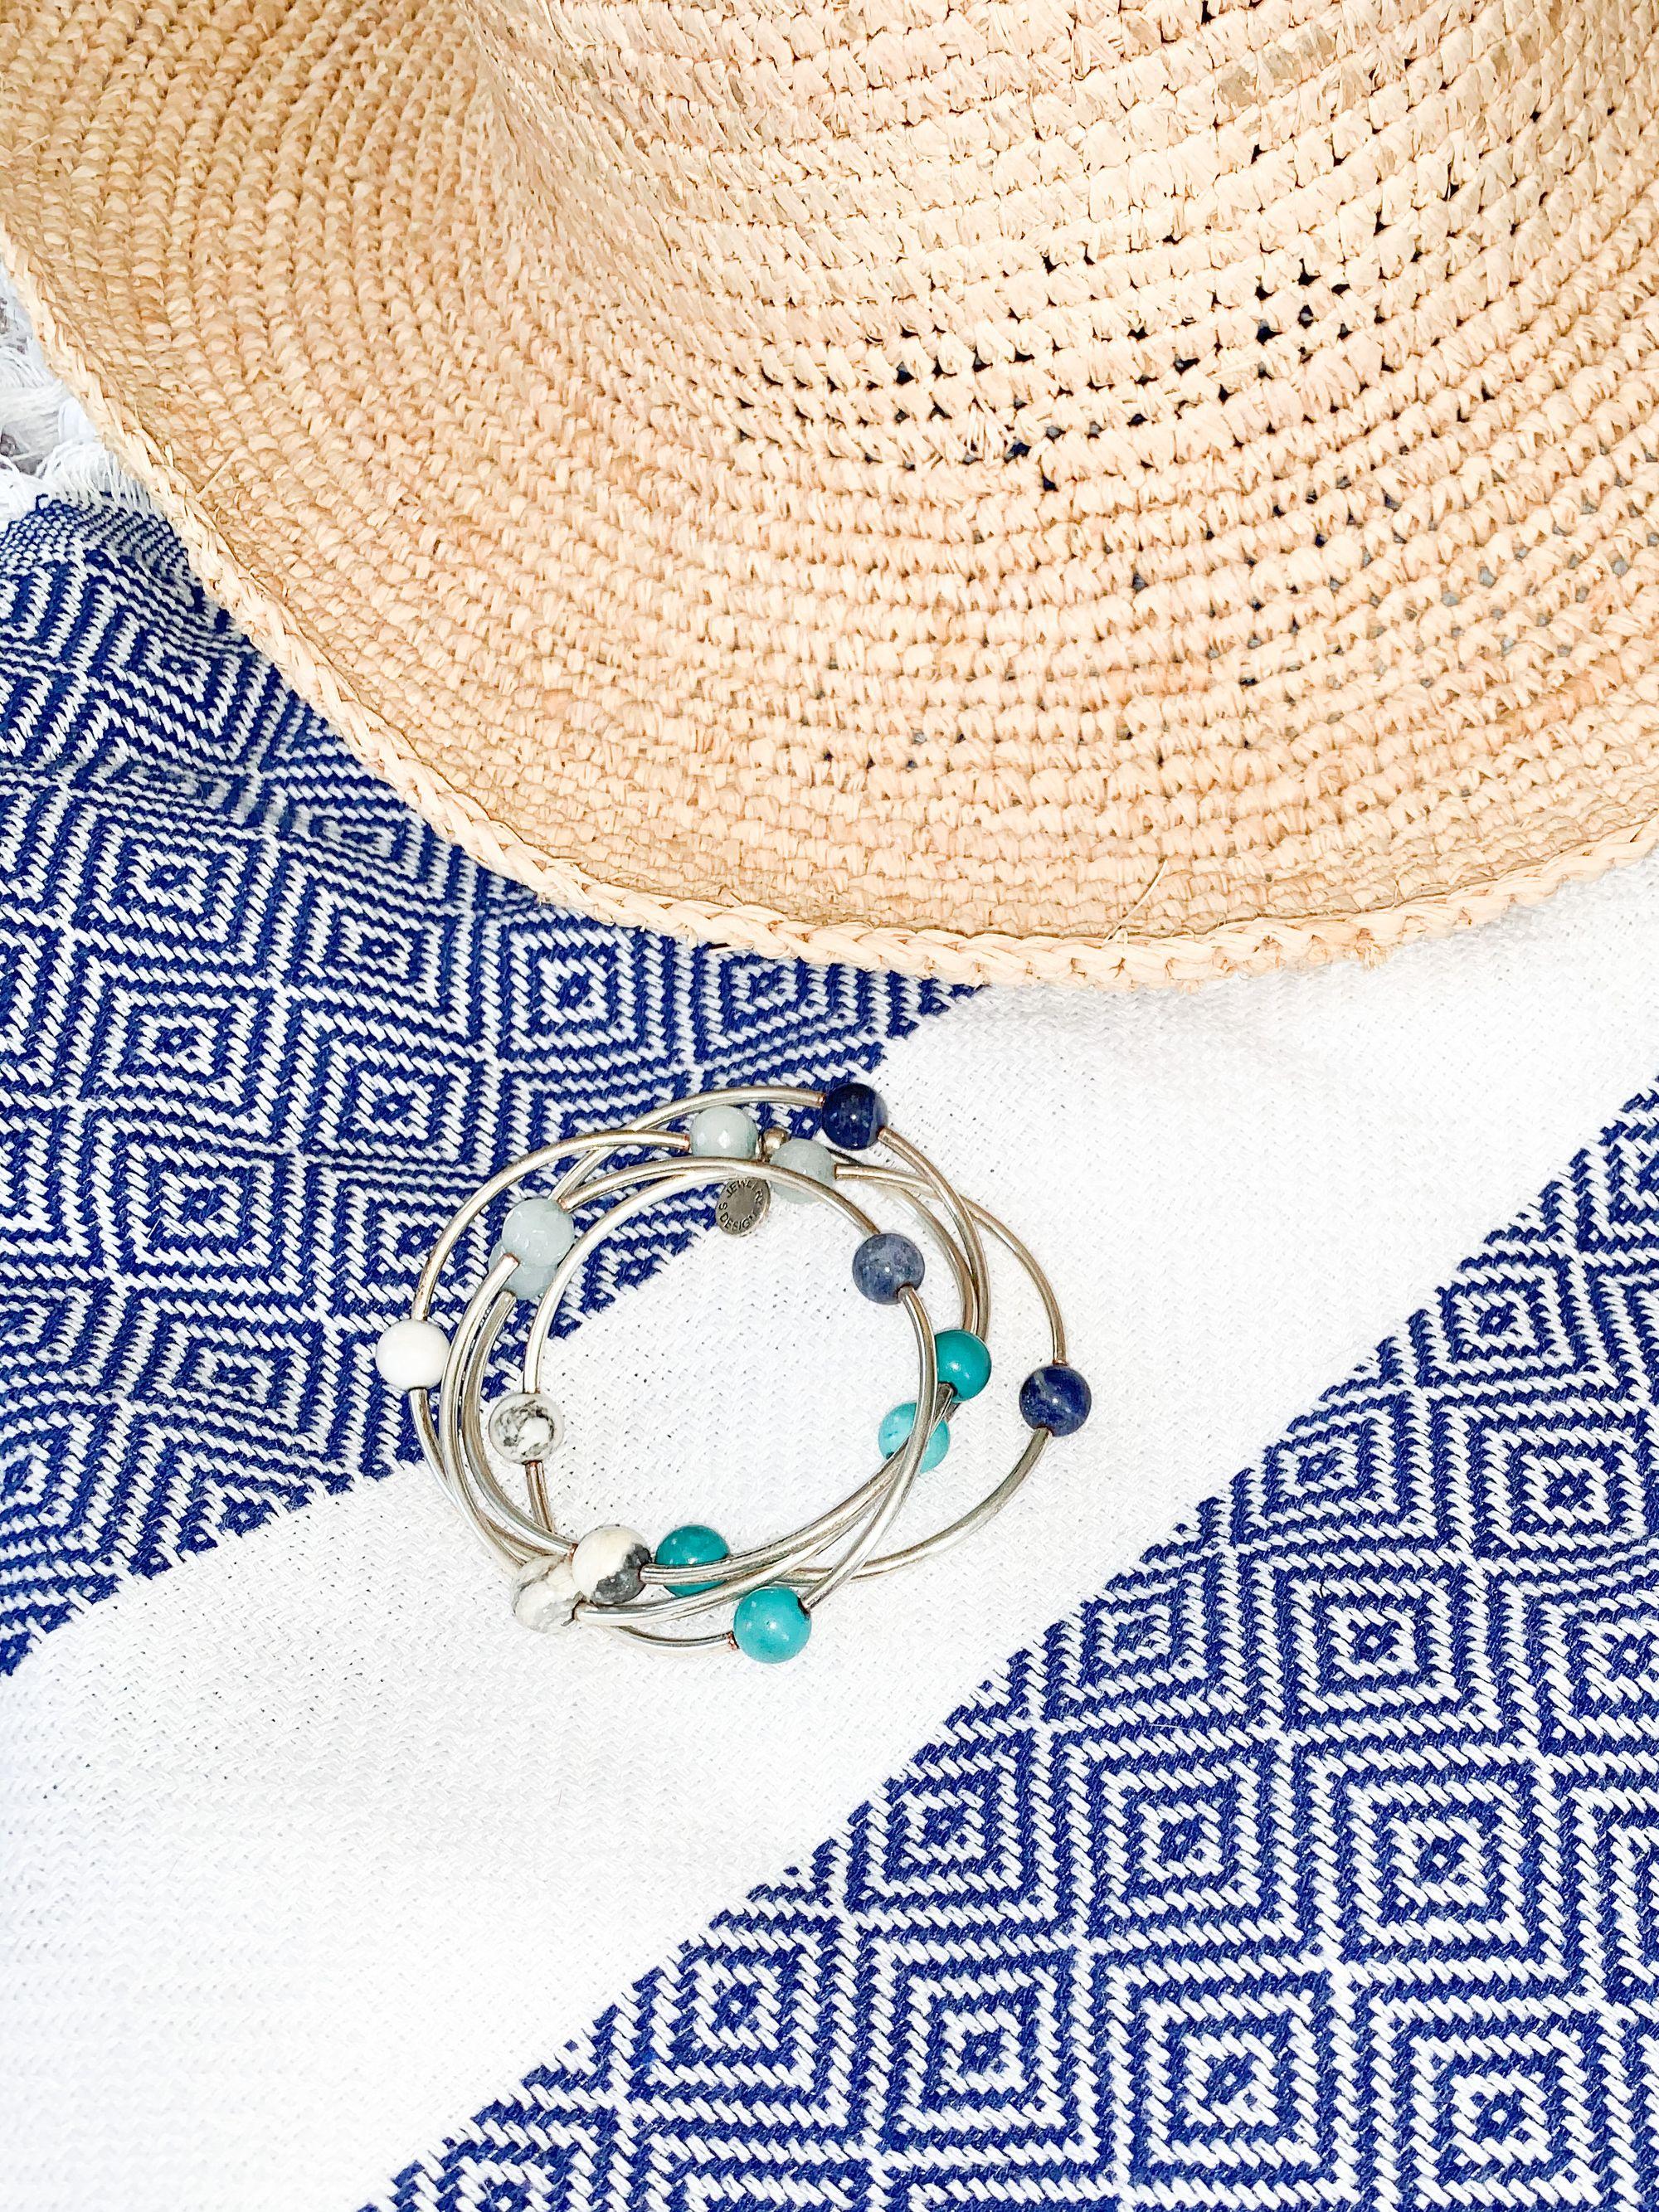 Beach bag essentials: sun hat, beach towel, coastal wrap, sunglasses, sunscreen, book, and a yummy snack. * * Featured Product: Coastal Stone Wrap . . . #sdesignjewelry#sdesign#staysavvy#girlboss#womenempoweringwomen#eachpurchaseemploysandempowers#usamade#naturalstones#empower#workingmoms#workingwomen#workingclass#workhardplayhard#feelgood#lookgood#beachbagessentials#sunhat#wrap#howlite#sodalite#turquoise#tiffanyblue#serenity#beachtowel#necklaceandwrap#sunscreen#beachseason#beachvibes#summer